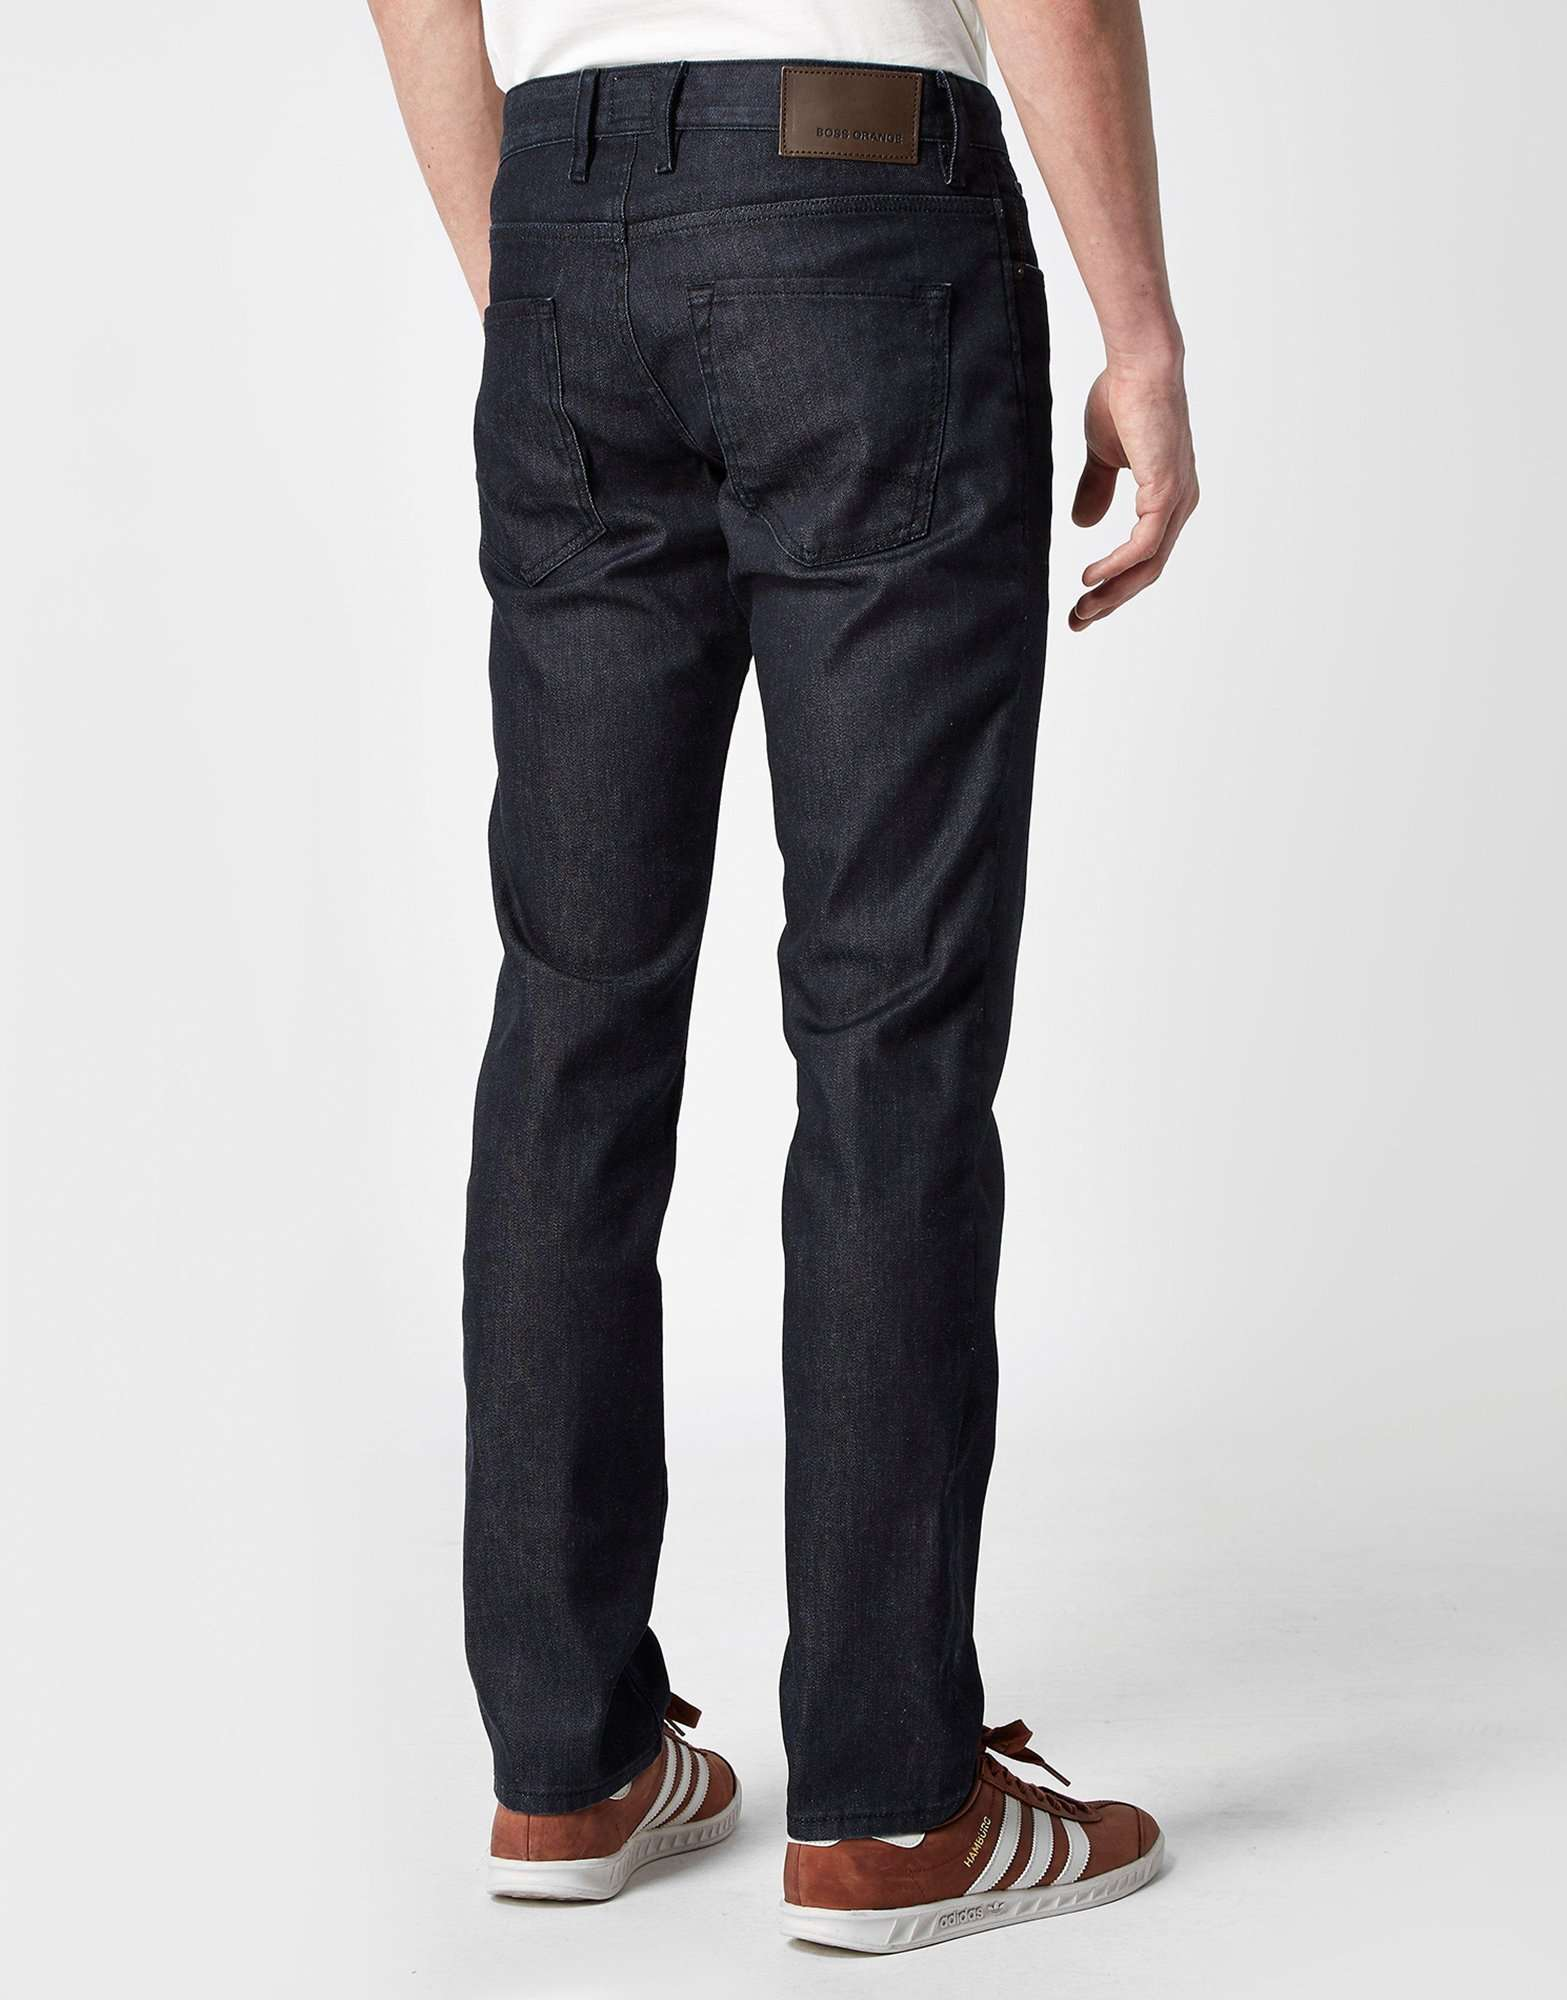 boss orange 24 barcelona jeans scotts menswear. Black Bedroom Furniture Sets. Home Design Ideas